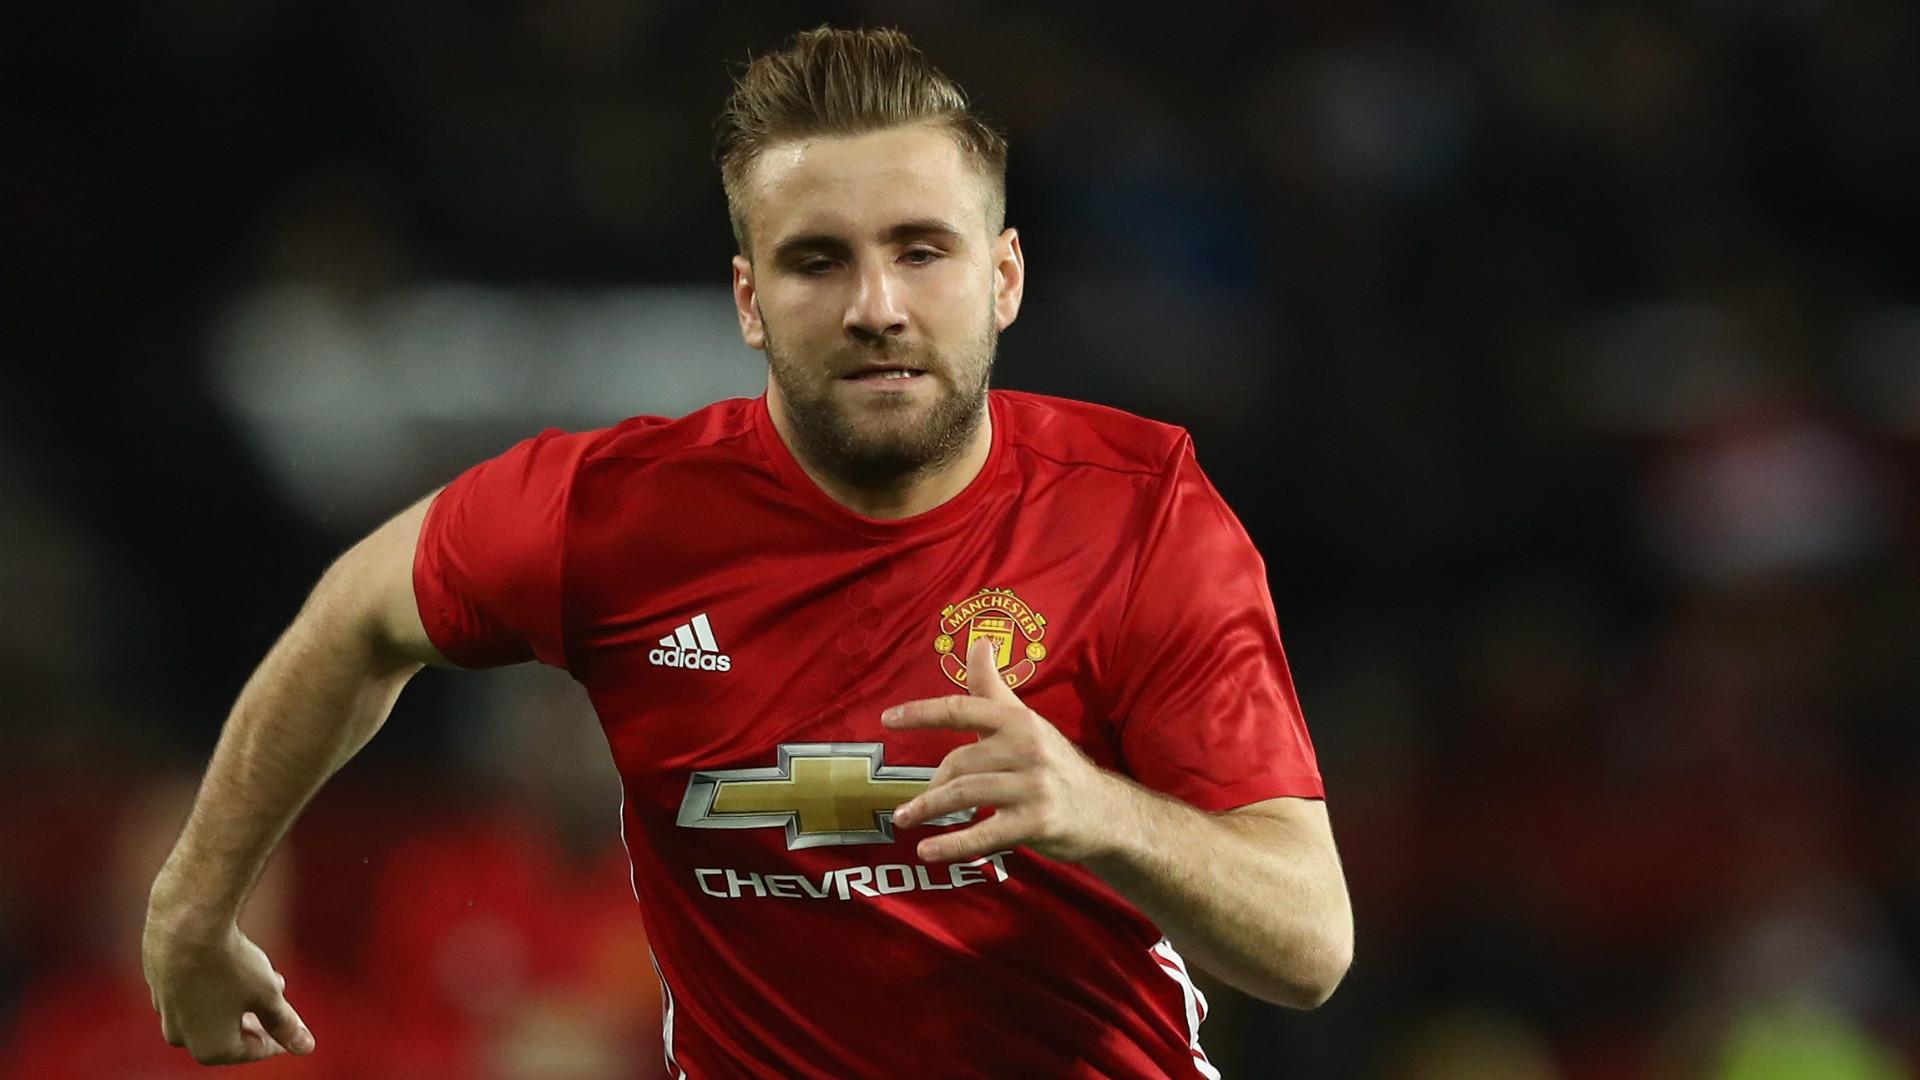 Luke Shaw Man Utd 2016